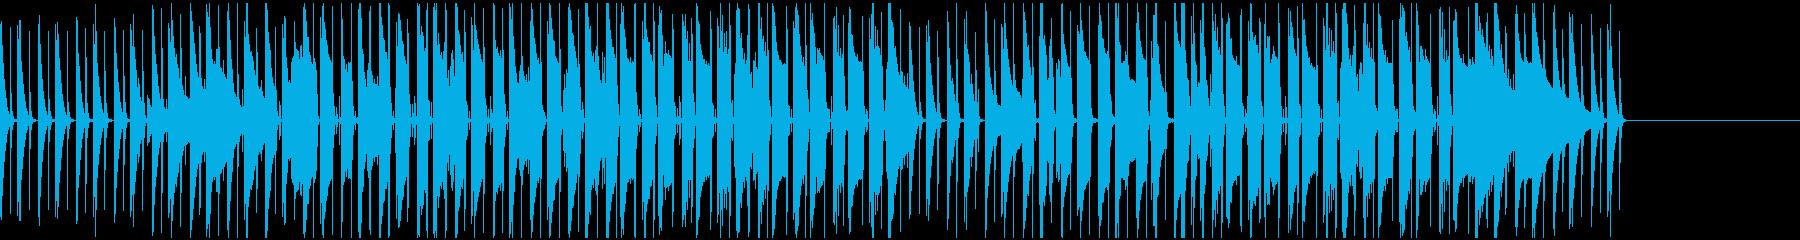 R&Bインストルメンタル。滑らかで...の再生済みの波形